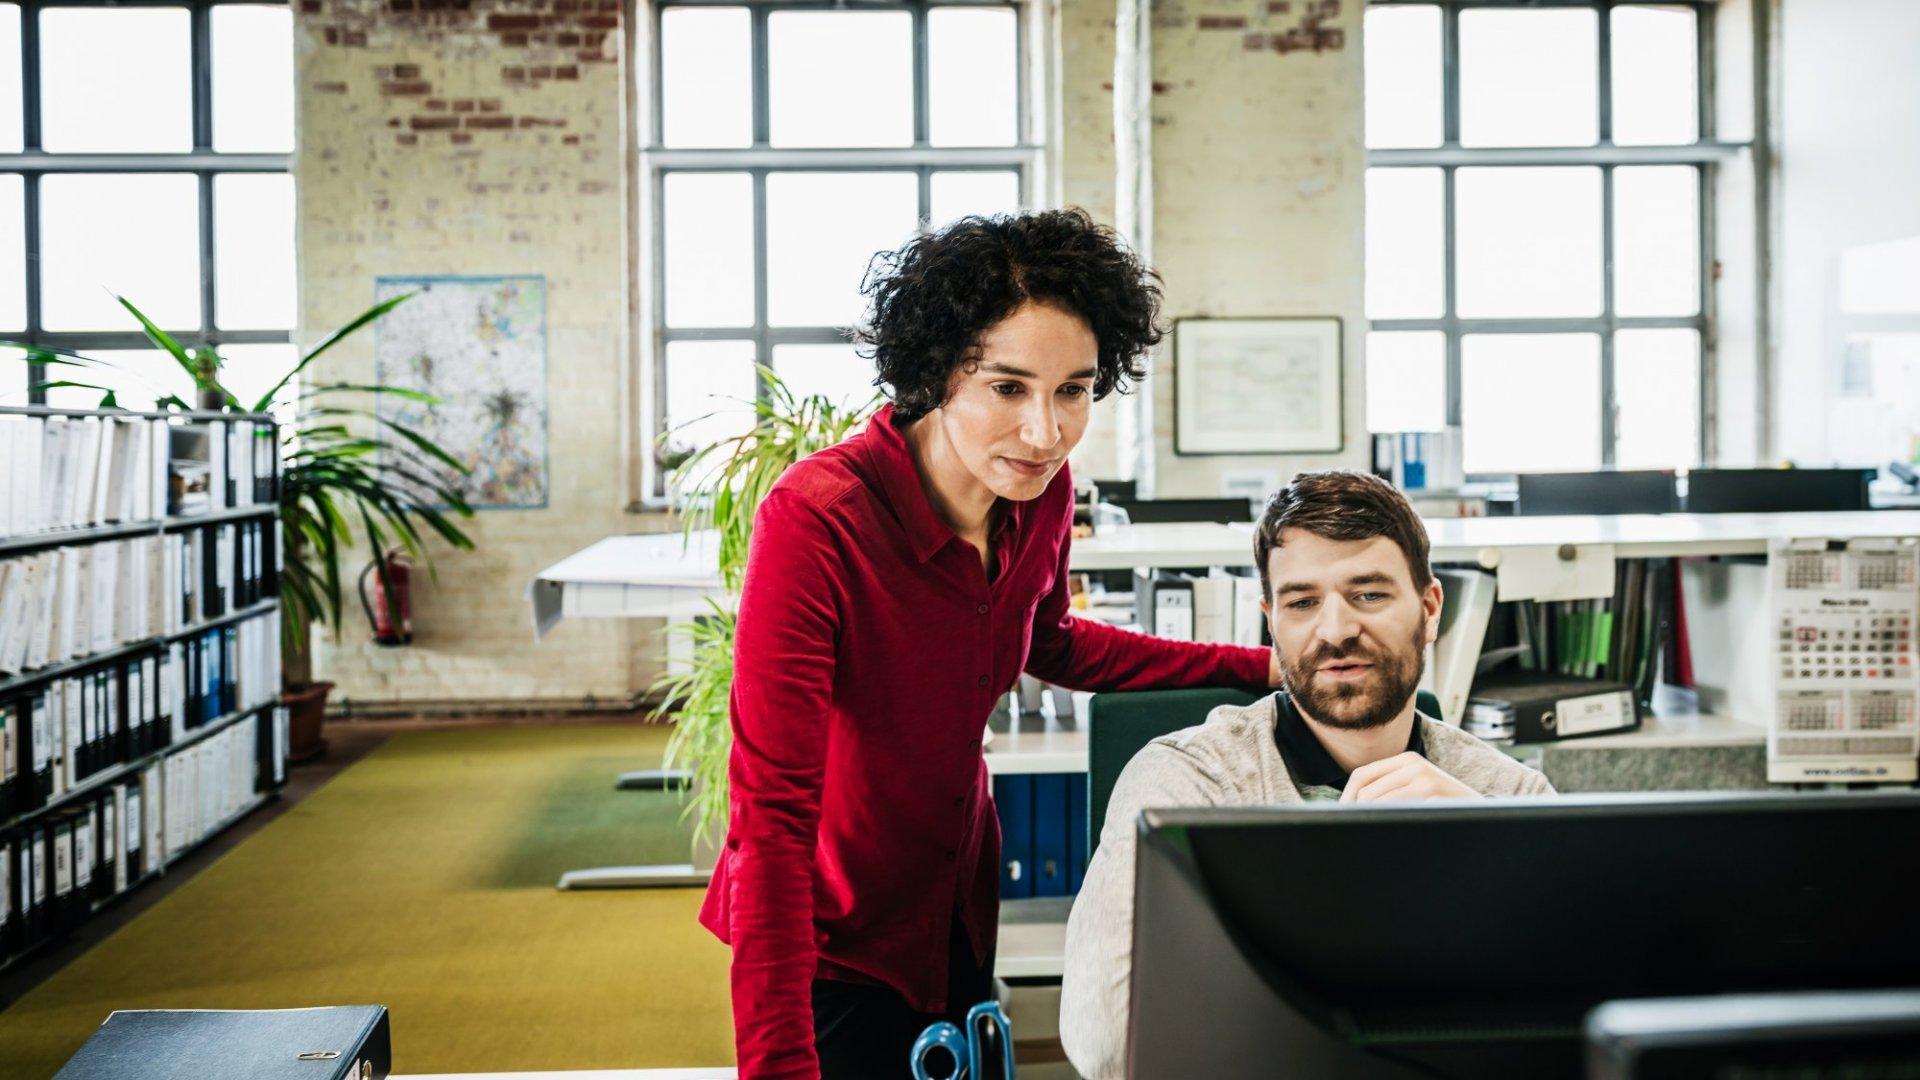 25 Communication Skills Every Manager Needs